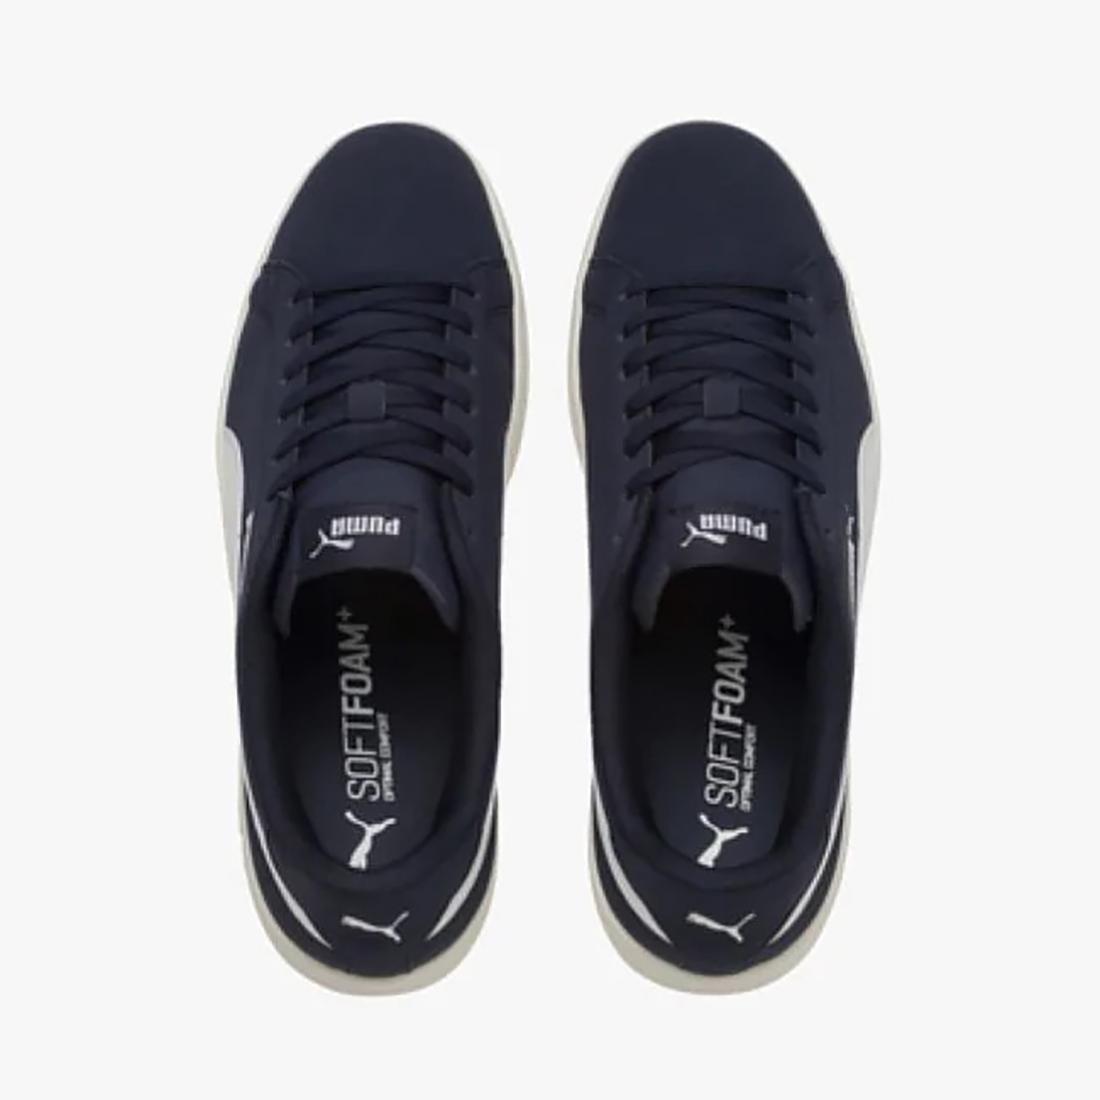 scarpe uomo sportive puma estive